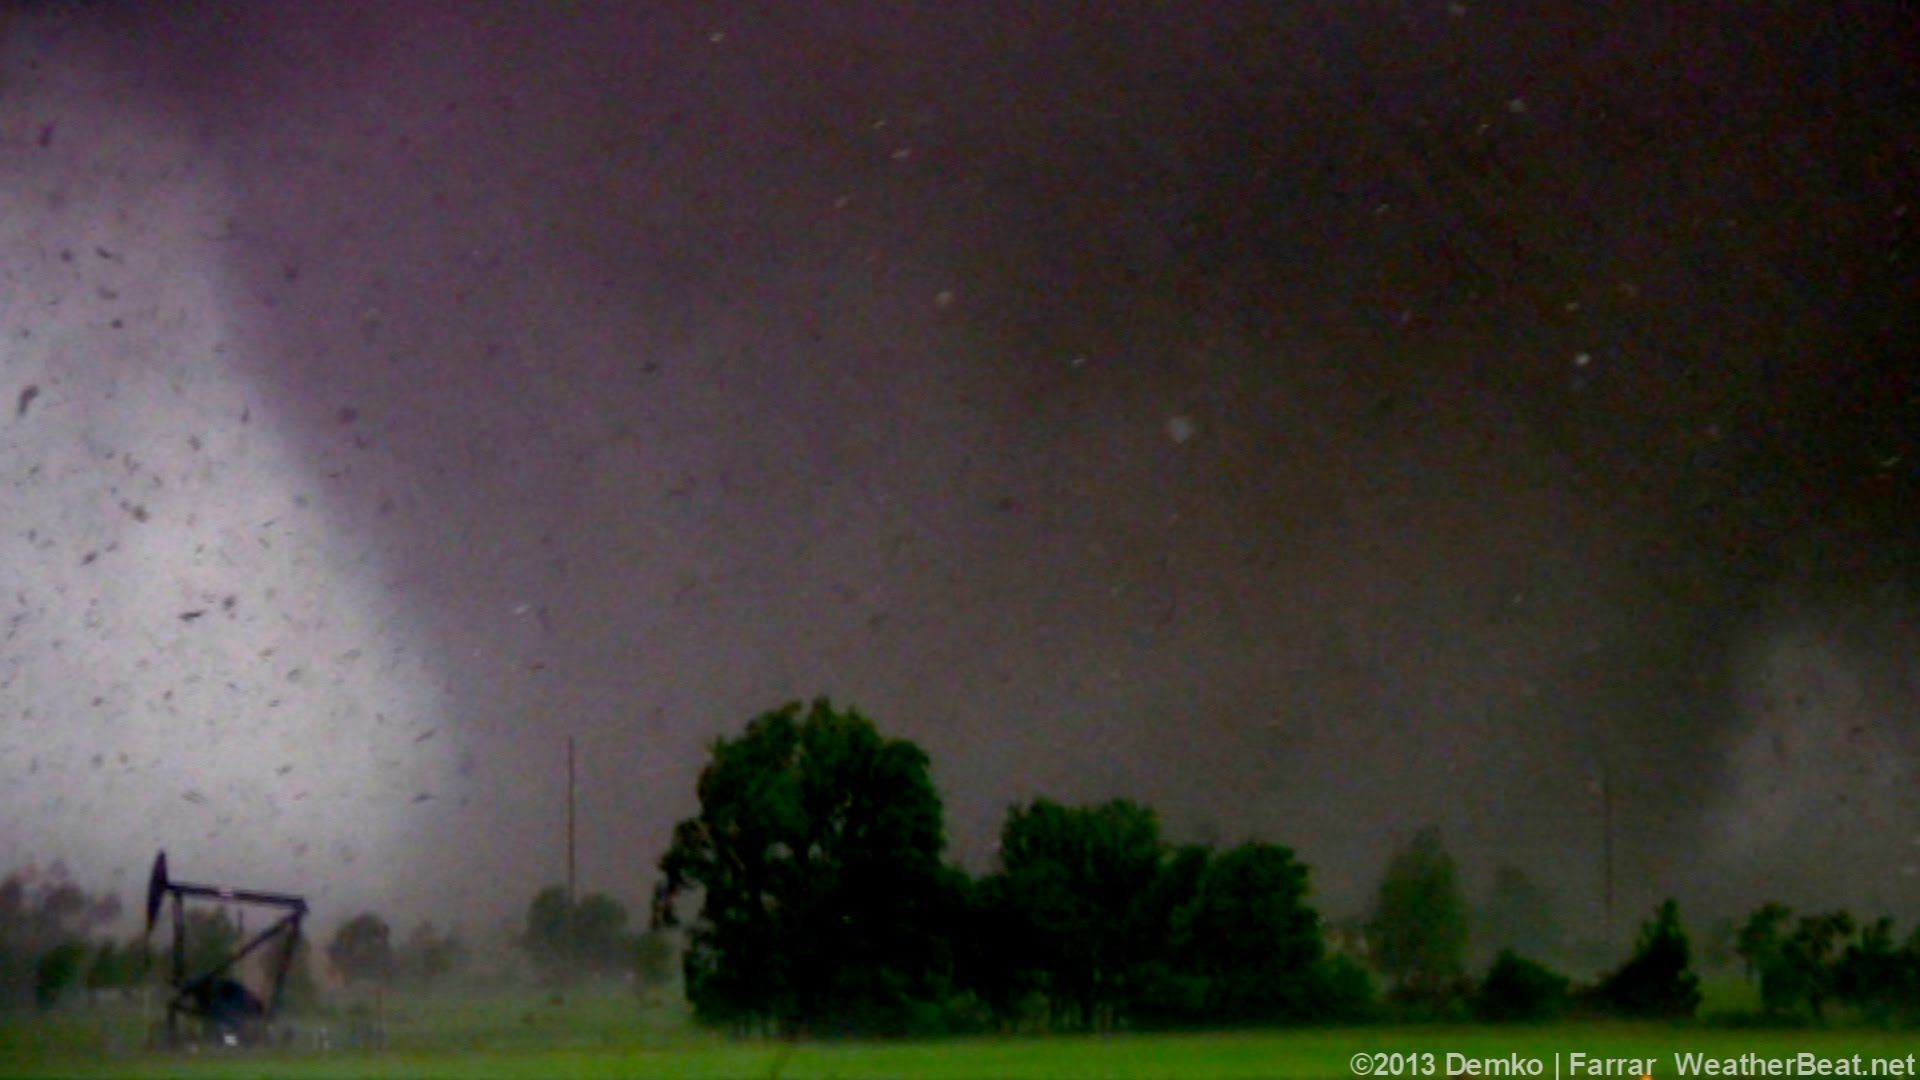 Horrific EF5 tornado in Moore, Oklahoma May 20, 2013